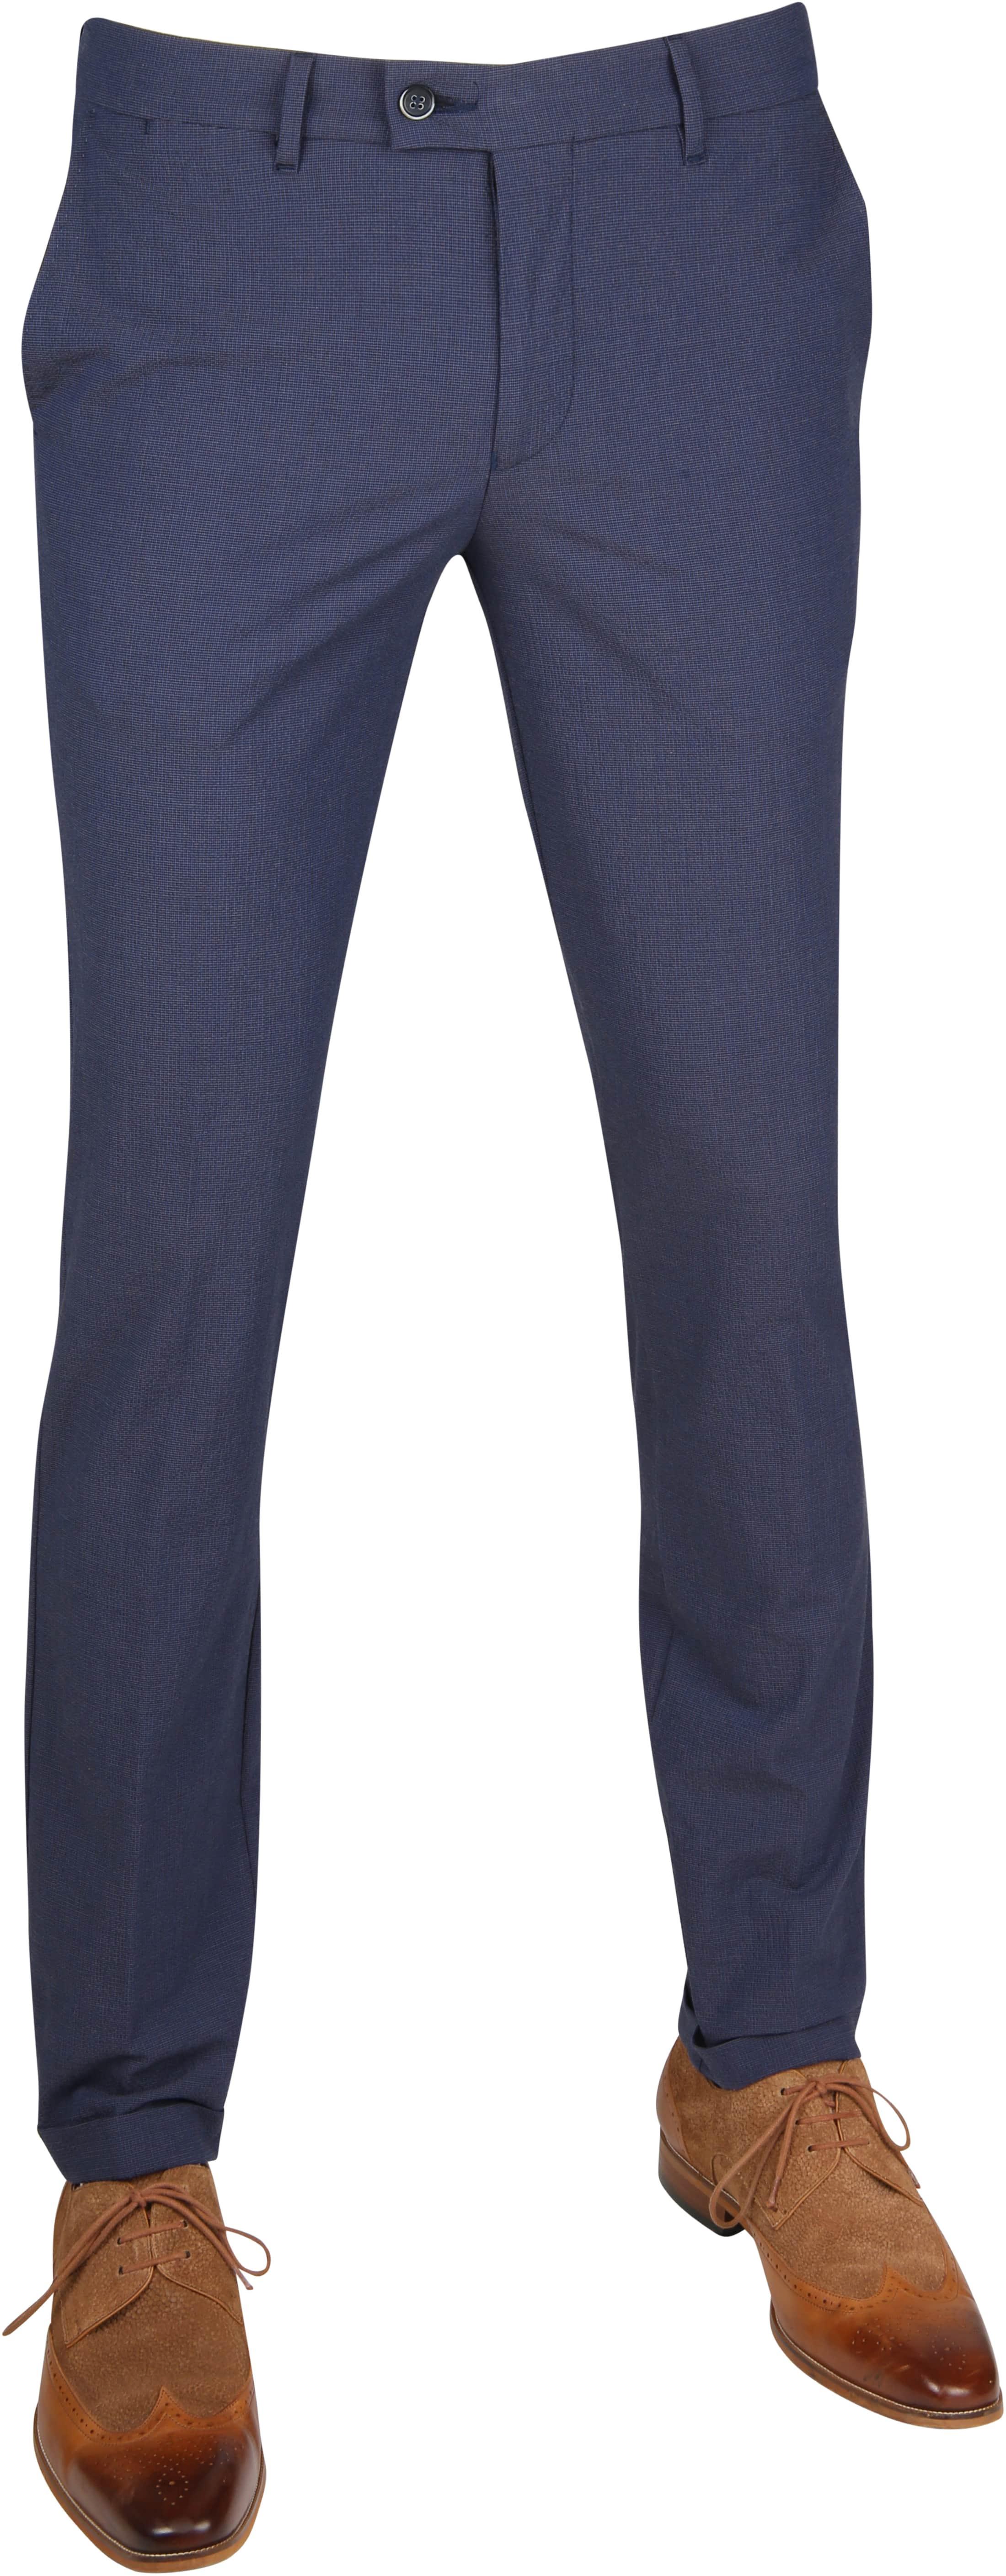 Suitable Pantalon Pisa Dessin Blau foto 0